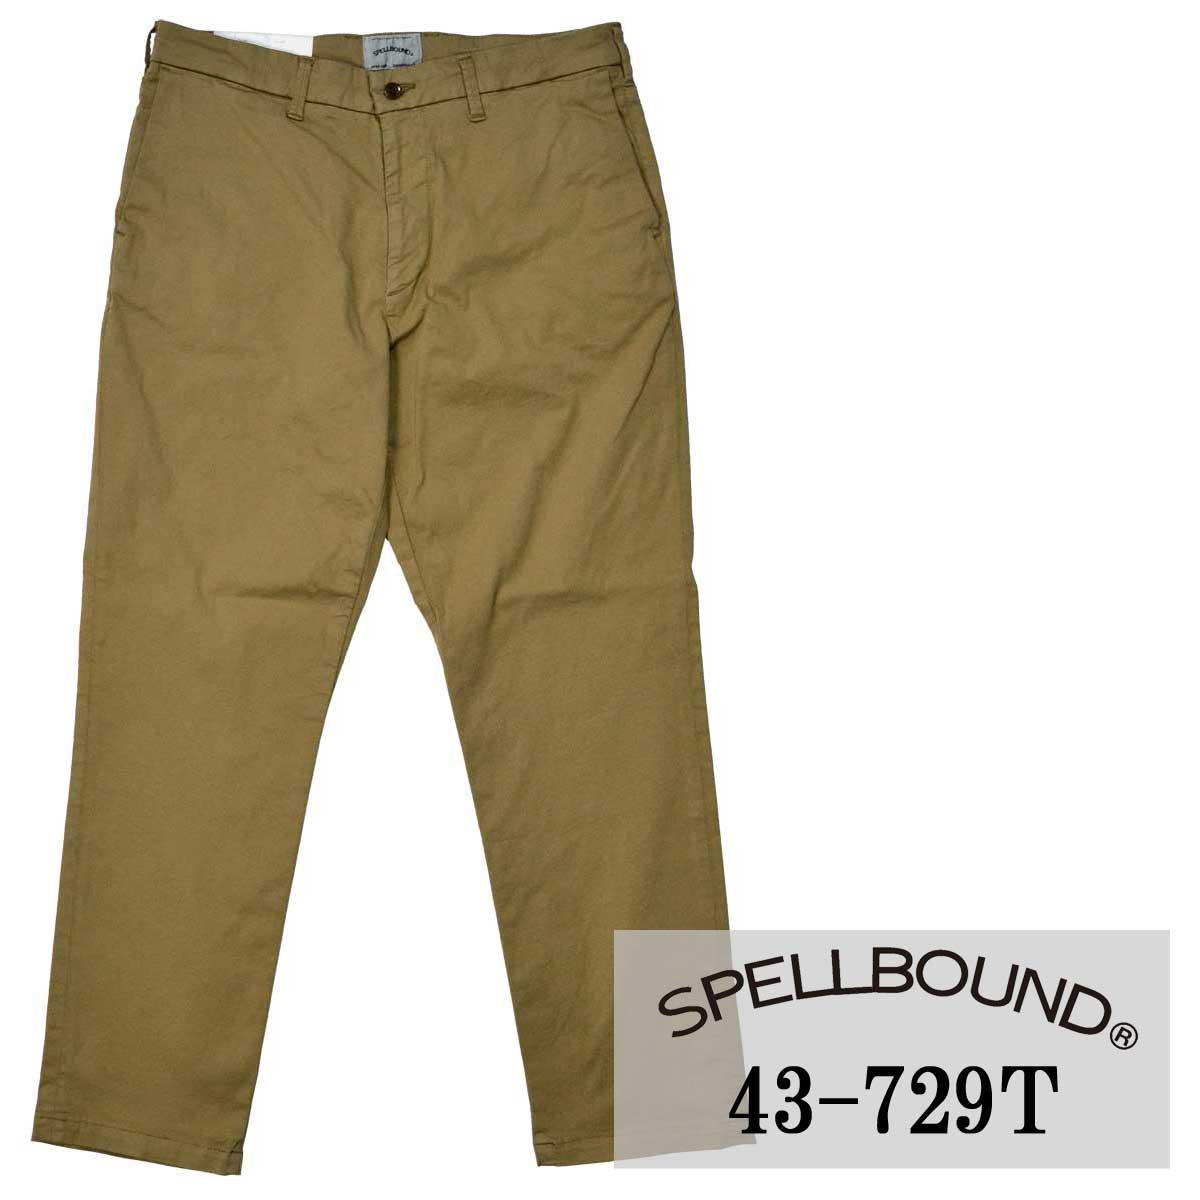 SPELLBOUND:ISKOストレッチチノ・リラクシングトラウザー(モカブラウン36-2):43-729T スペルバウンド メンズ イスコ パンツ 裾上げ